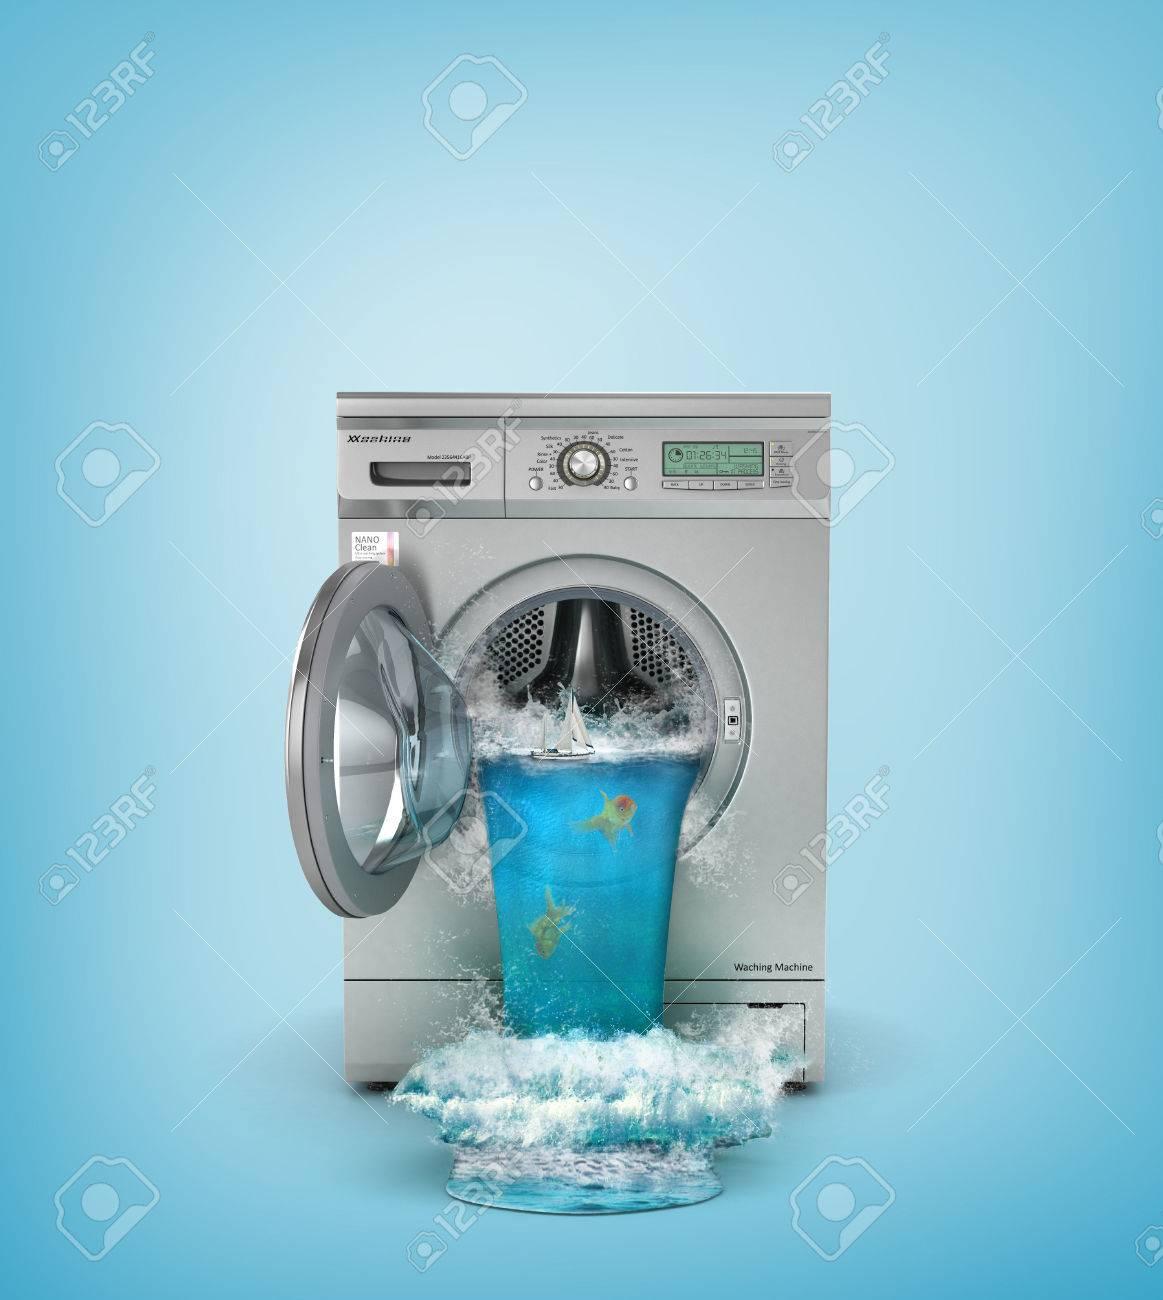 Concept of washing. Broken washing machine. The waterfall follows from open window of washing machine. 3d illustration - 60937973